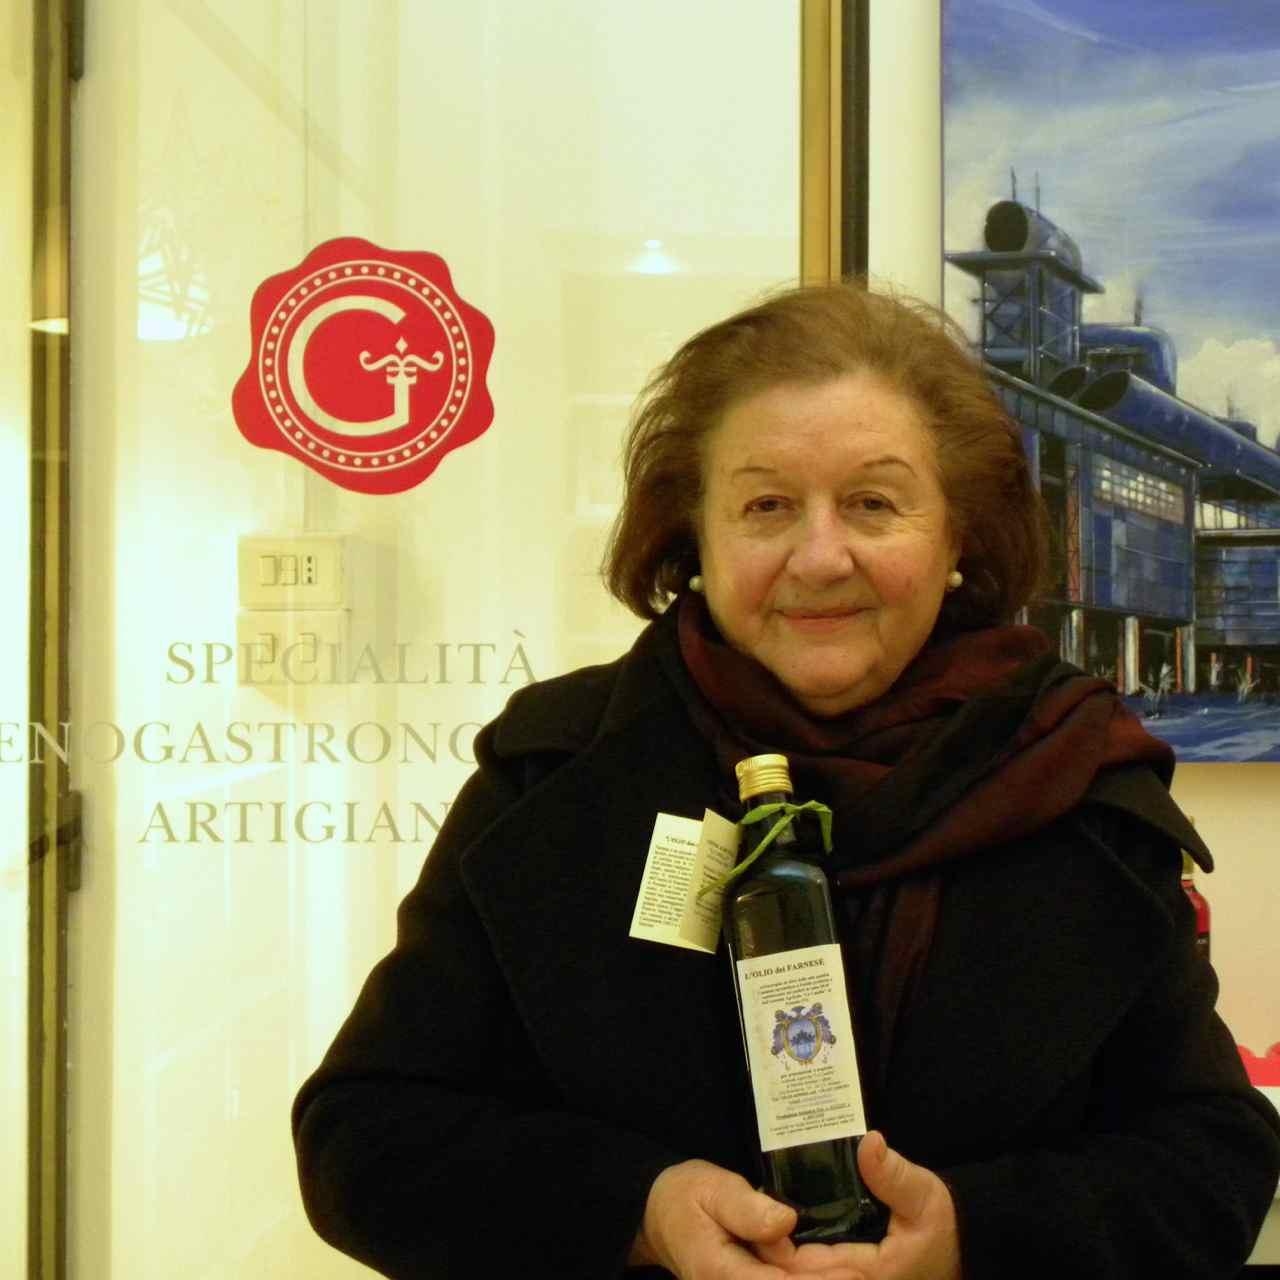 Mirella Bersani Calleri - Olio extravergine di oliva Farnese - Farnese Extra Virgin Olive Oil - Gustorotondo - Italian food boutique